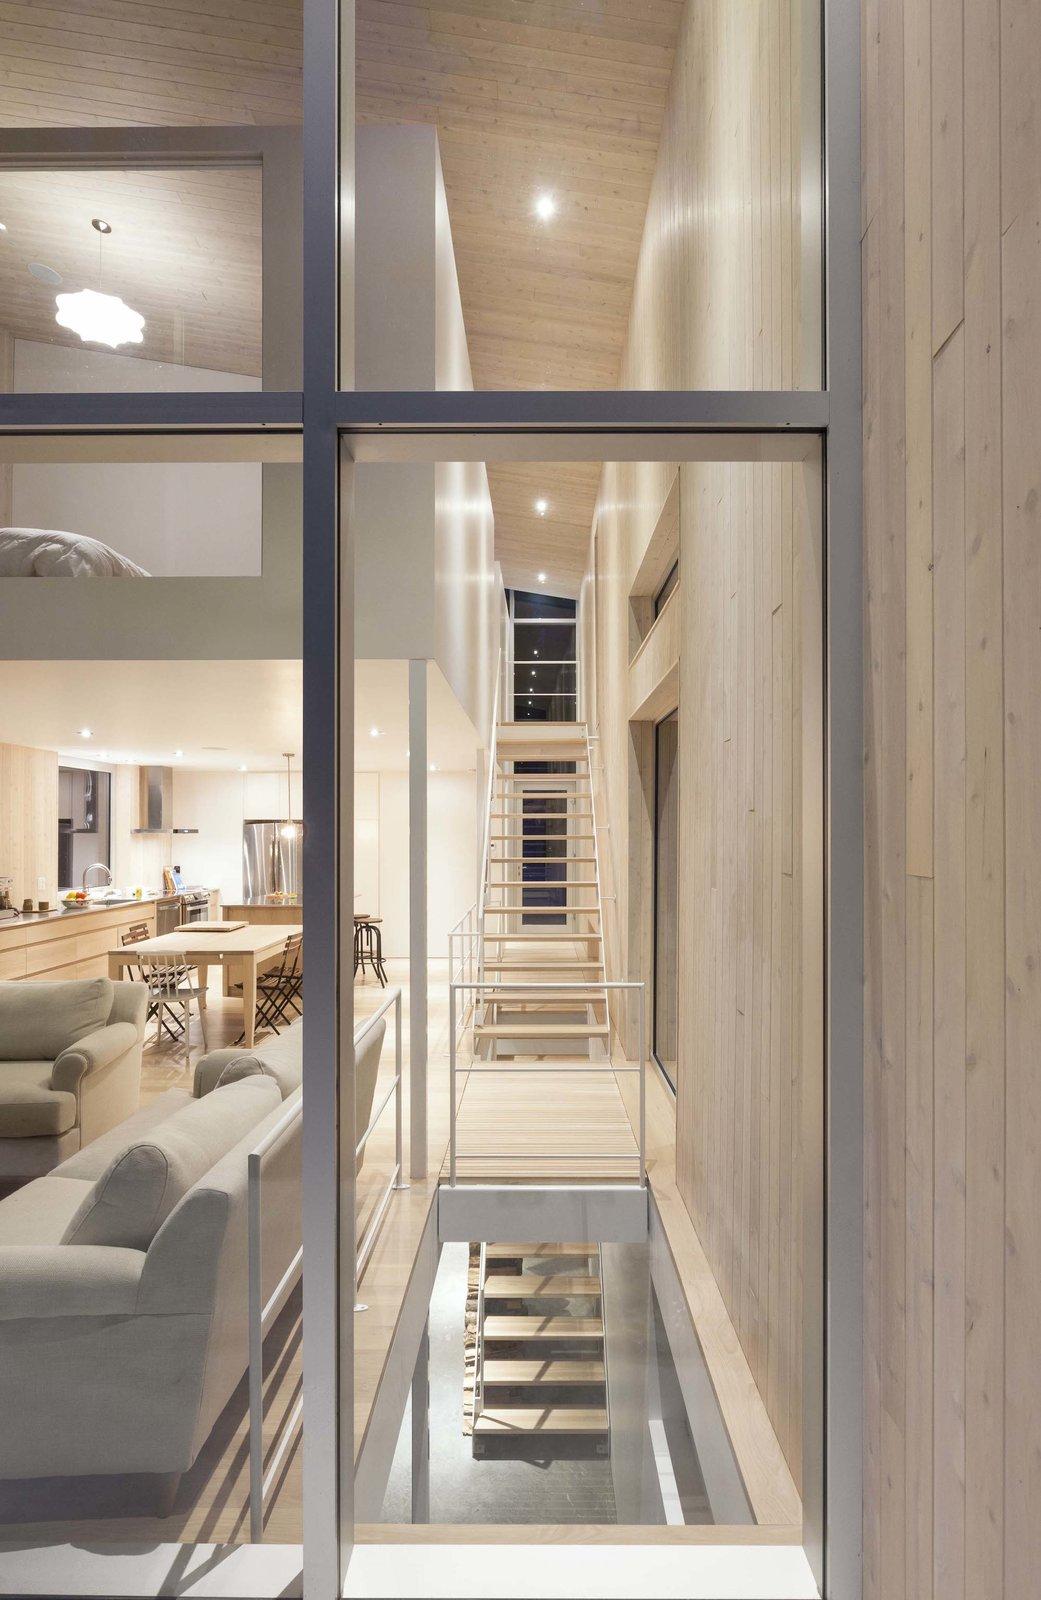 Photo 2 of 5 in La Maison Haute by Atelier Pierre Thibault